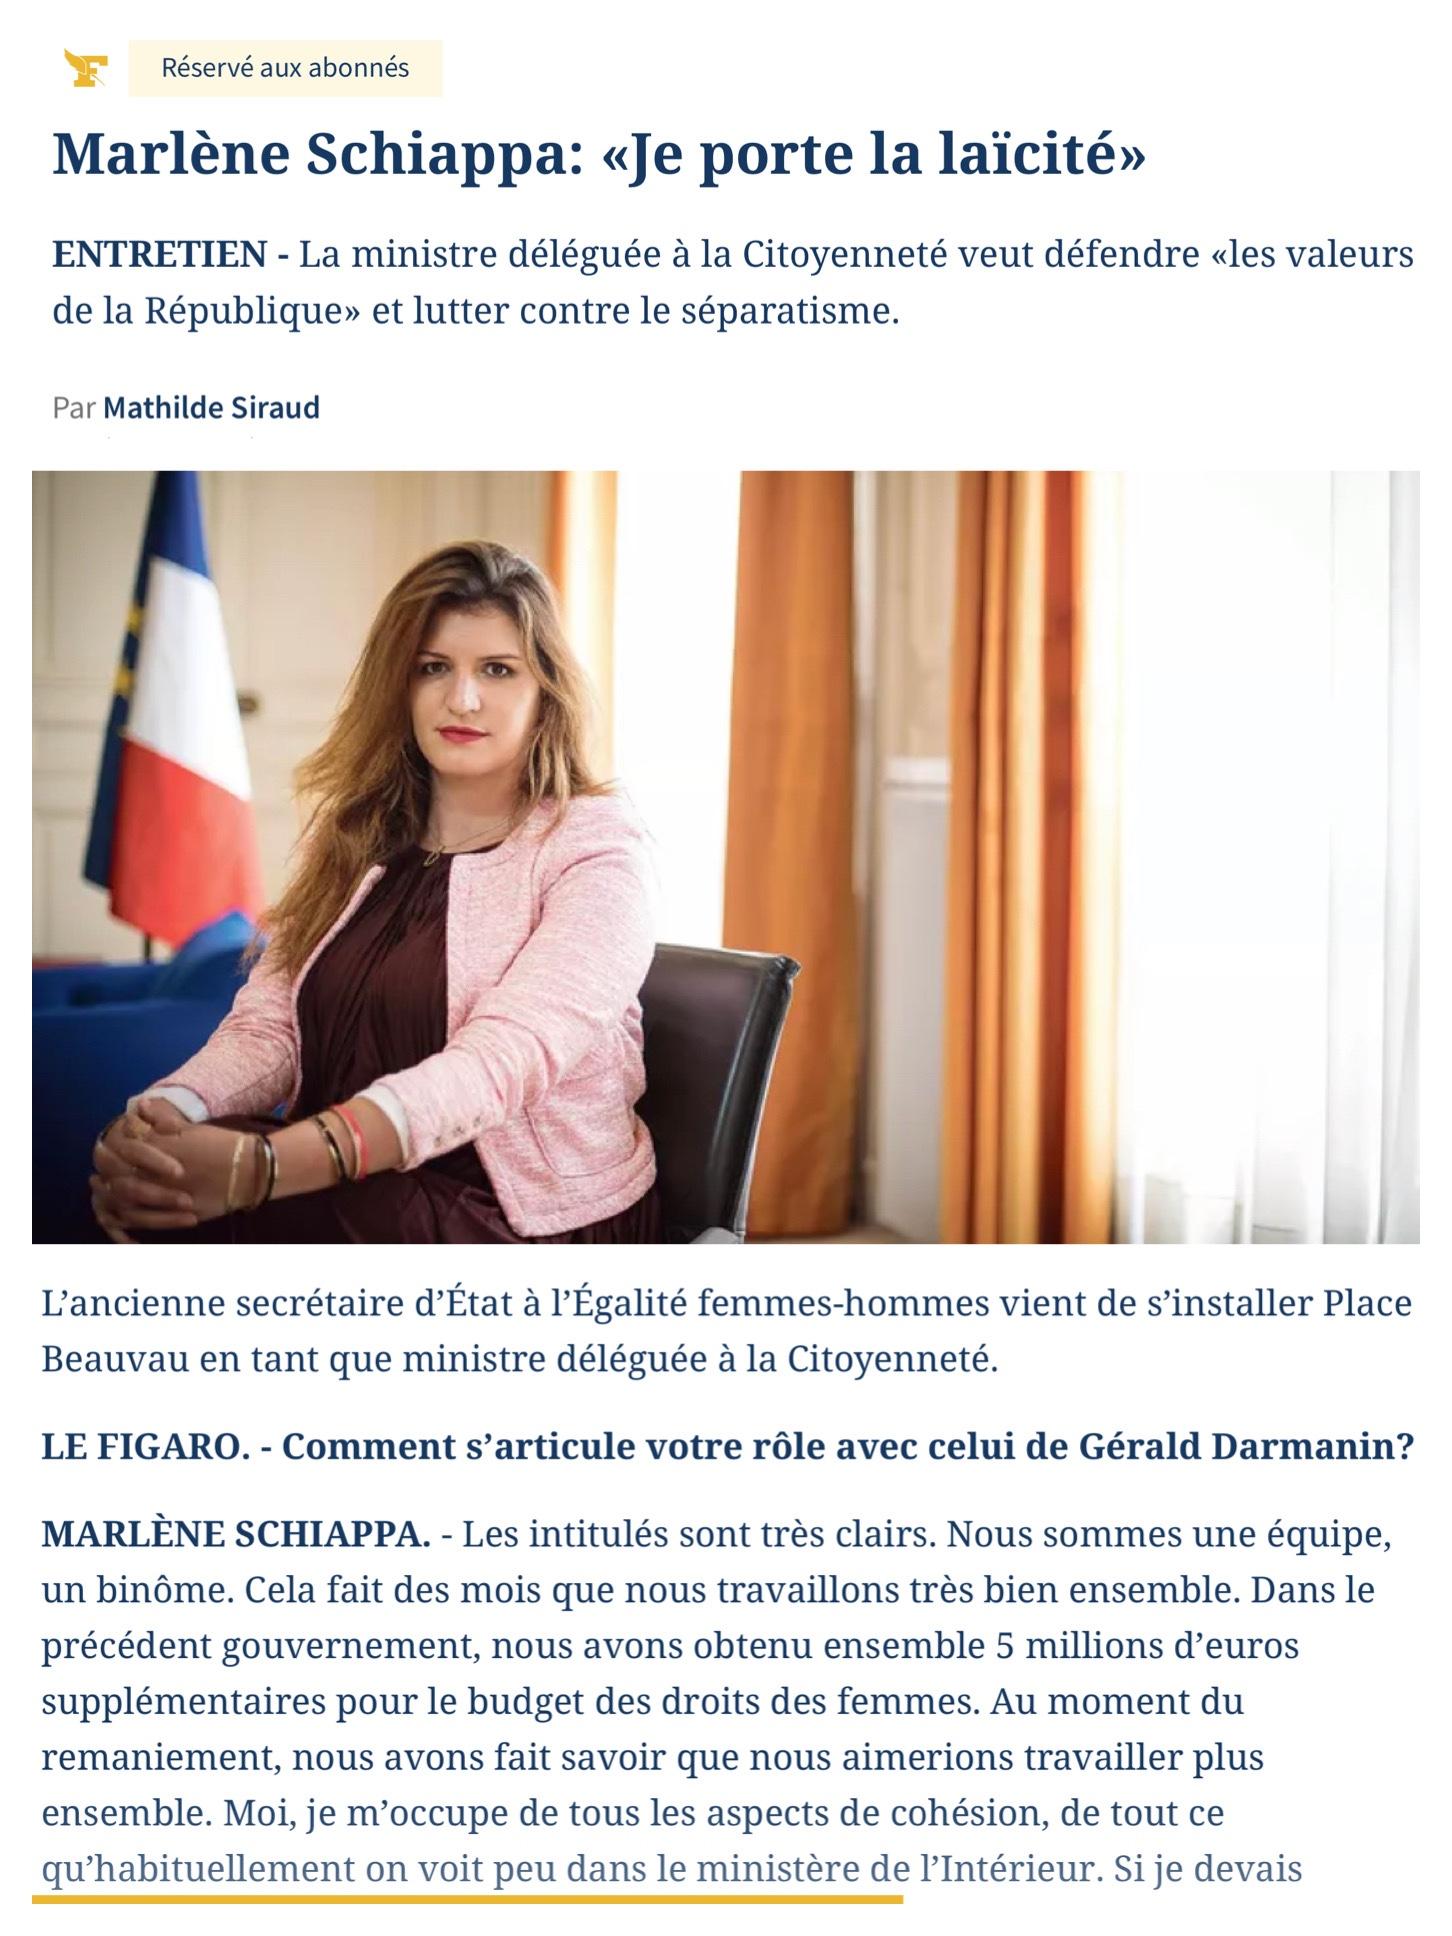 Marlene Schiappa Laîcité